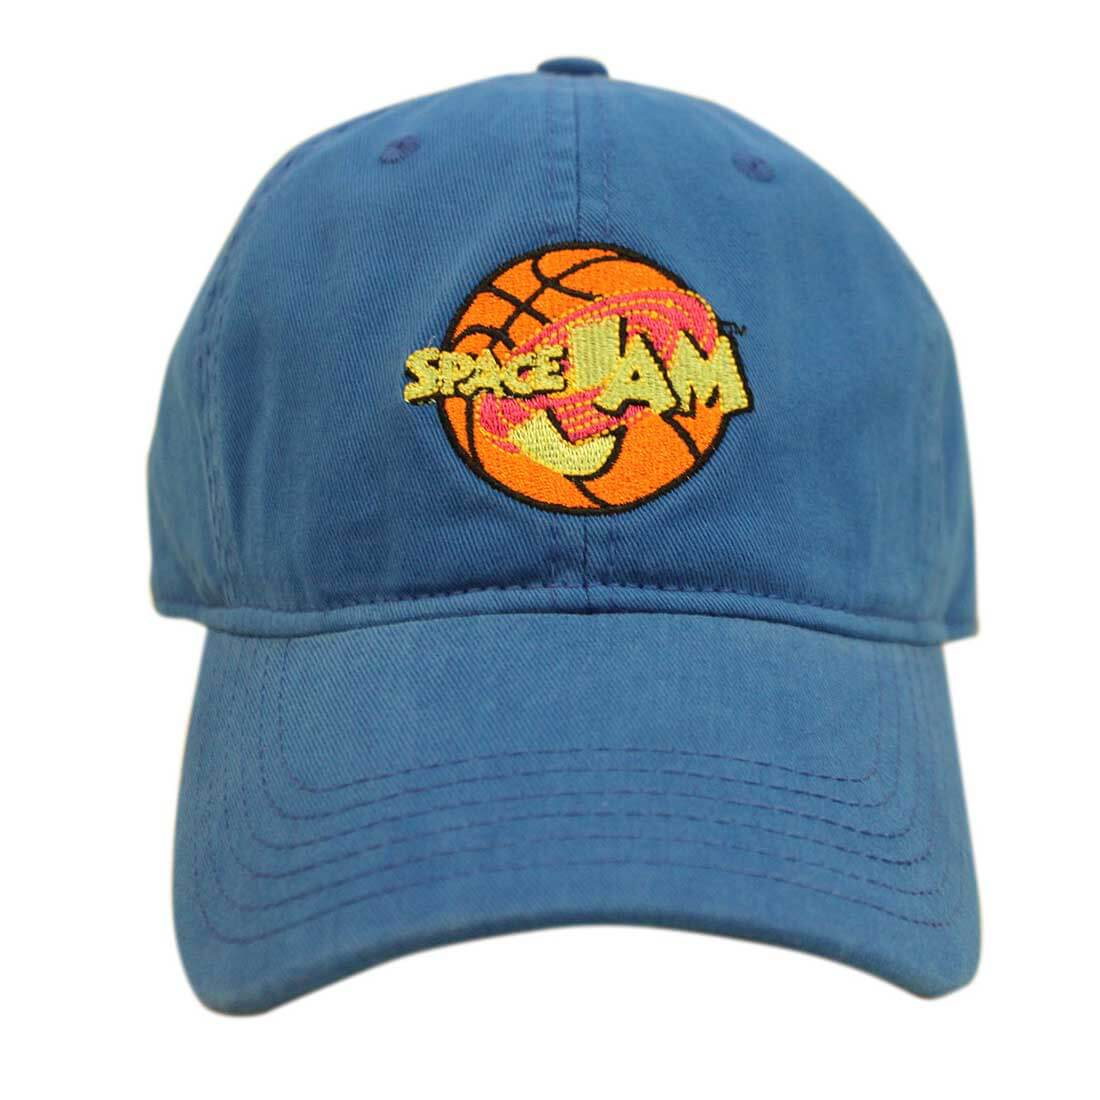 69cef45dd Men's Hats - Cracker Barrel